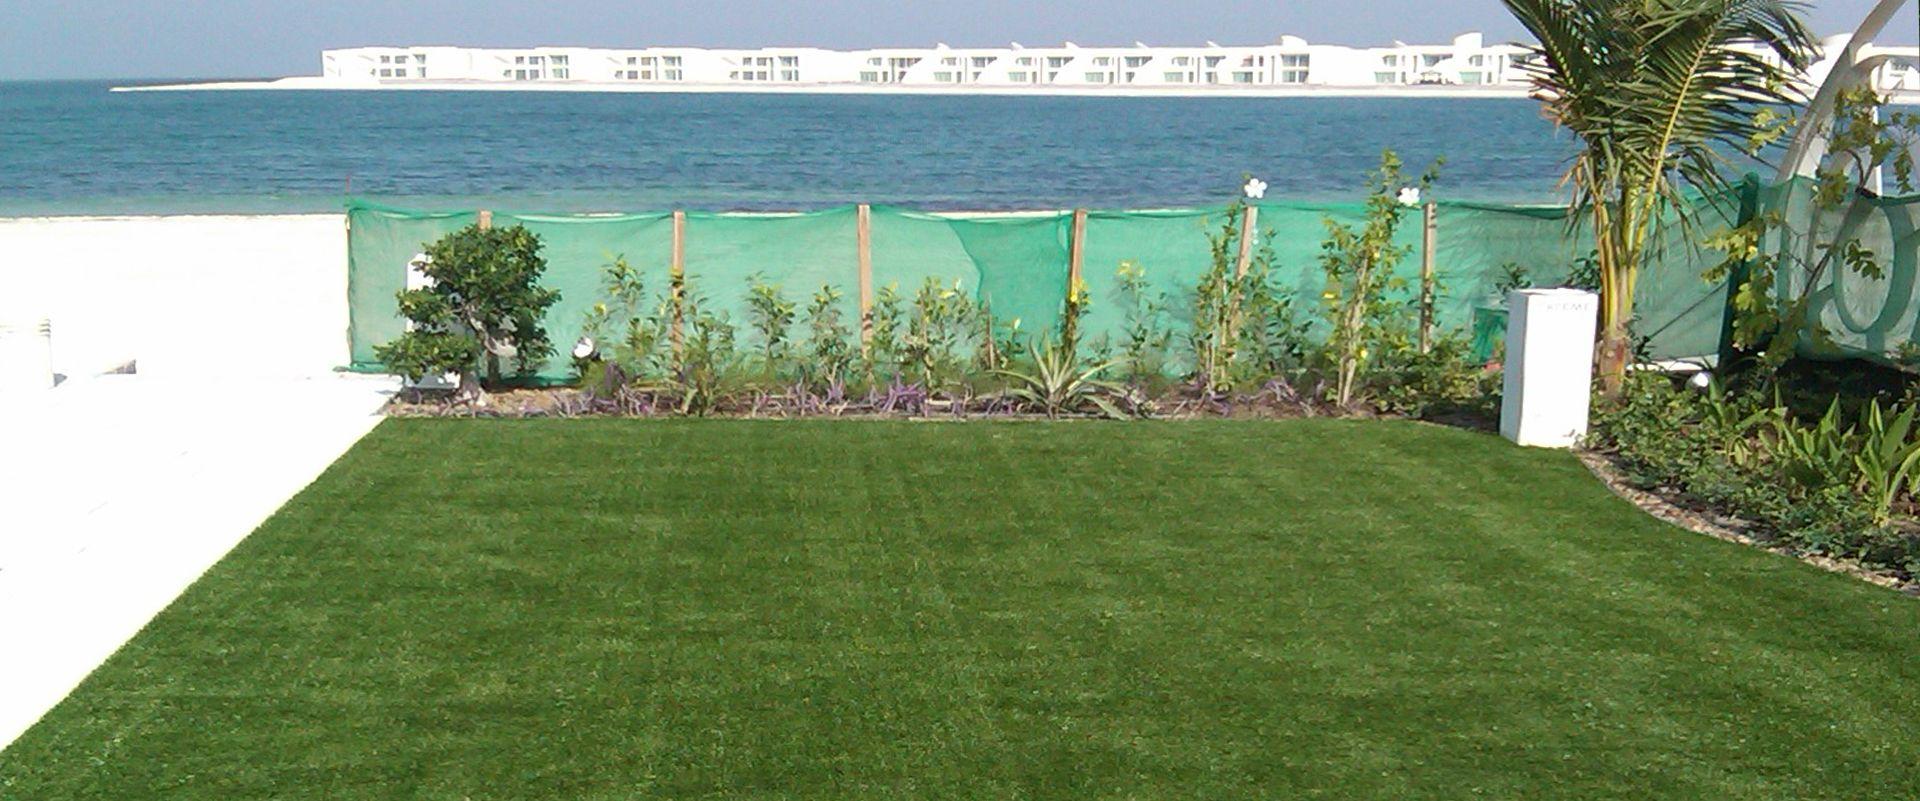 Green Vision Green Garden Landscape